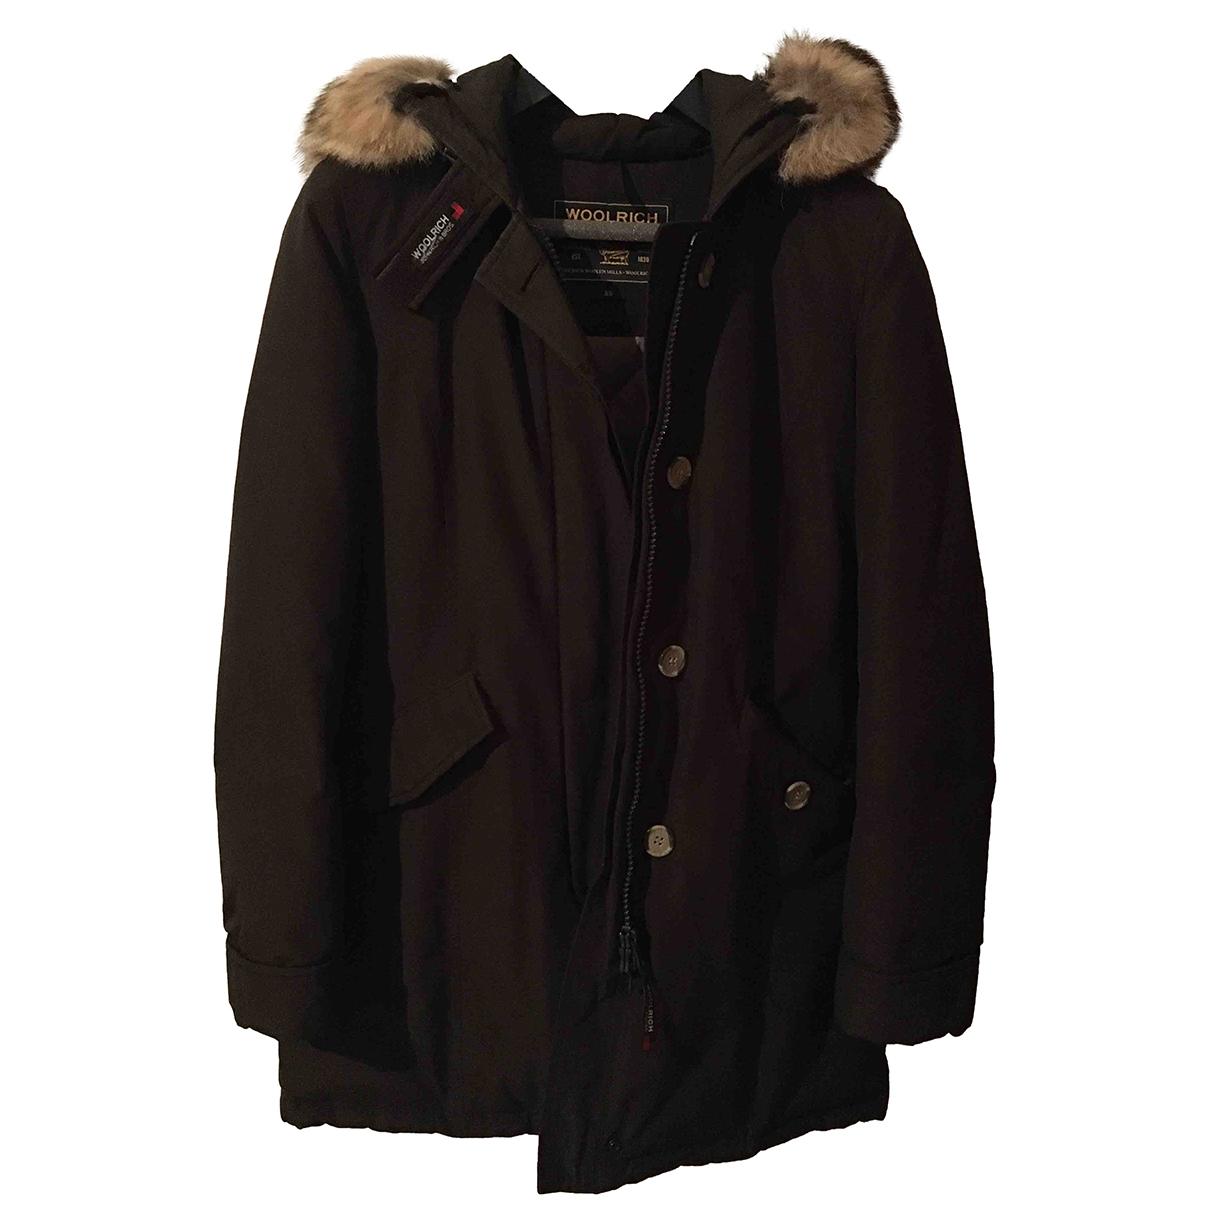 Woolrich \N Brown coat for Women XS International